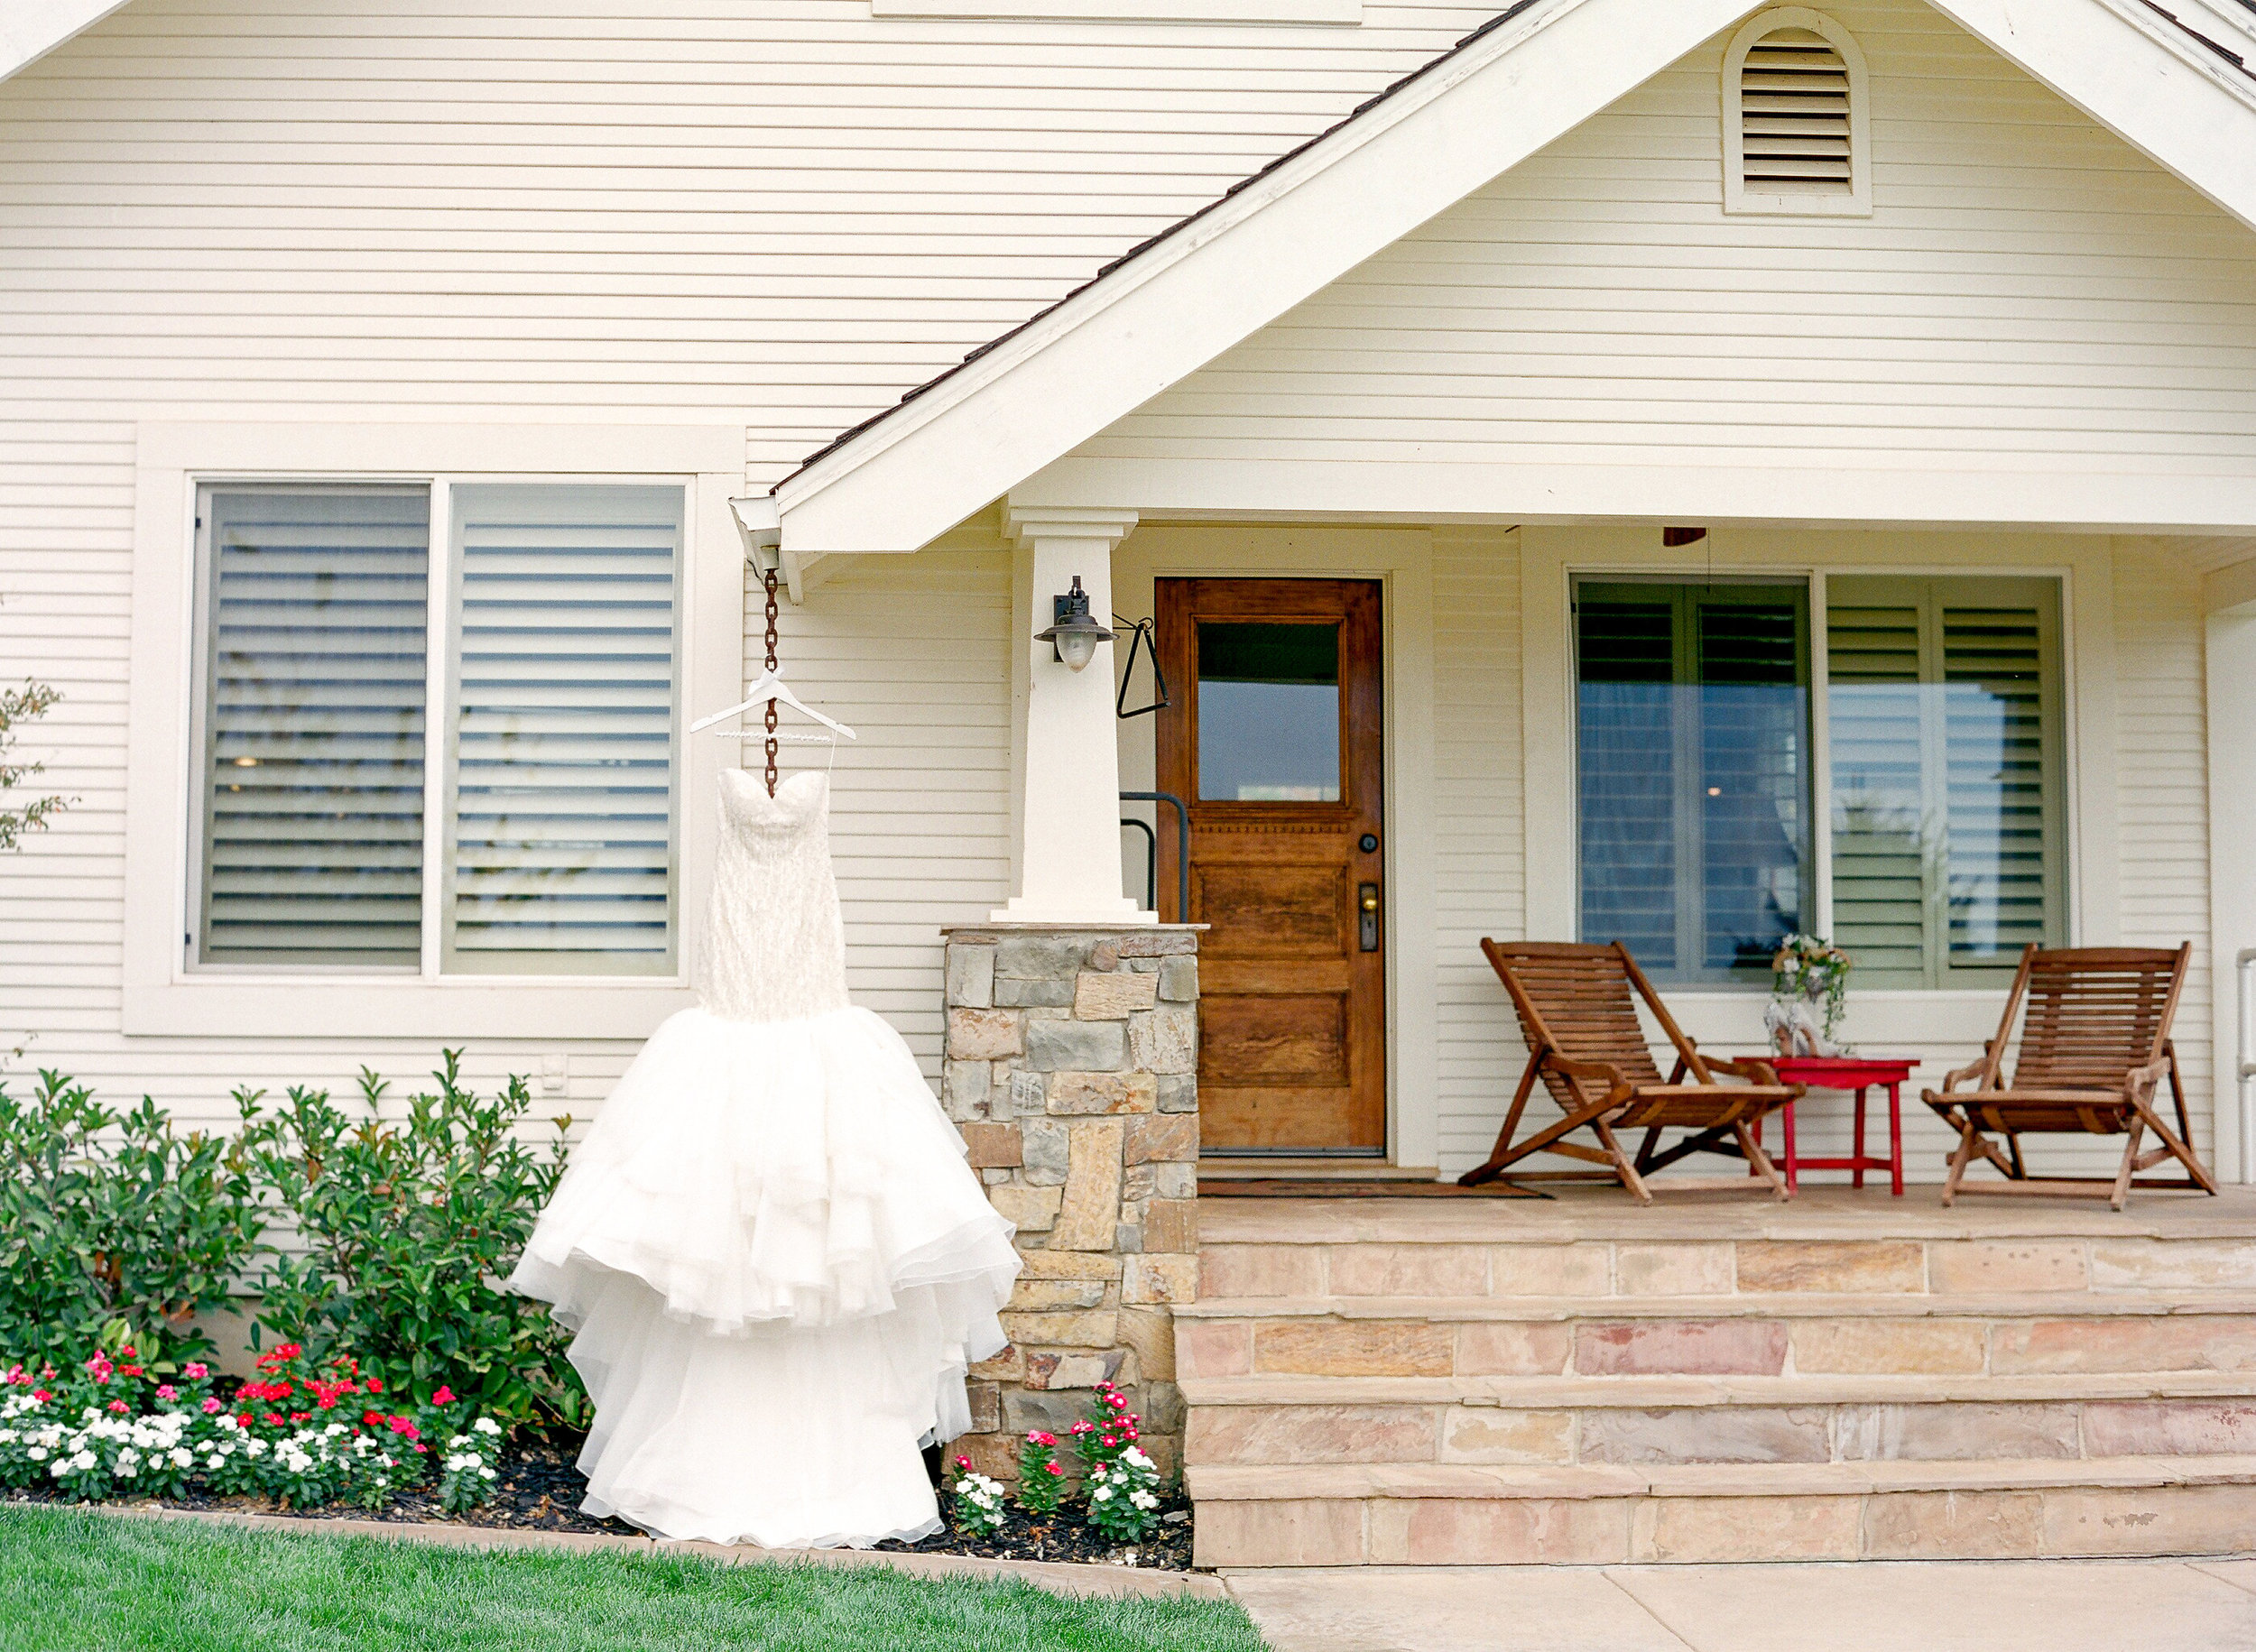 Amador_County_Wedding_House_Rancho Victoria_Vineyard_Bride_Dress_Northern_California.jpg